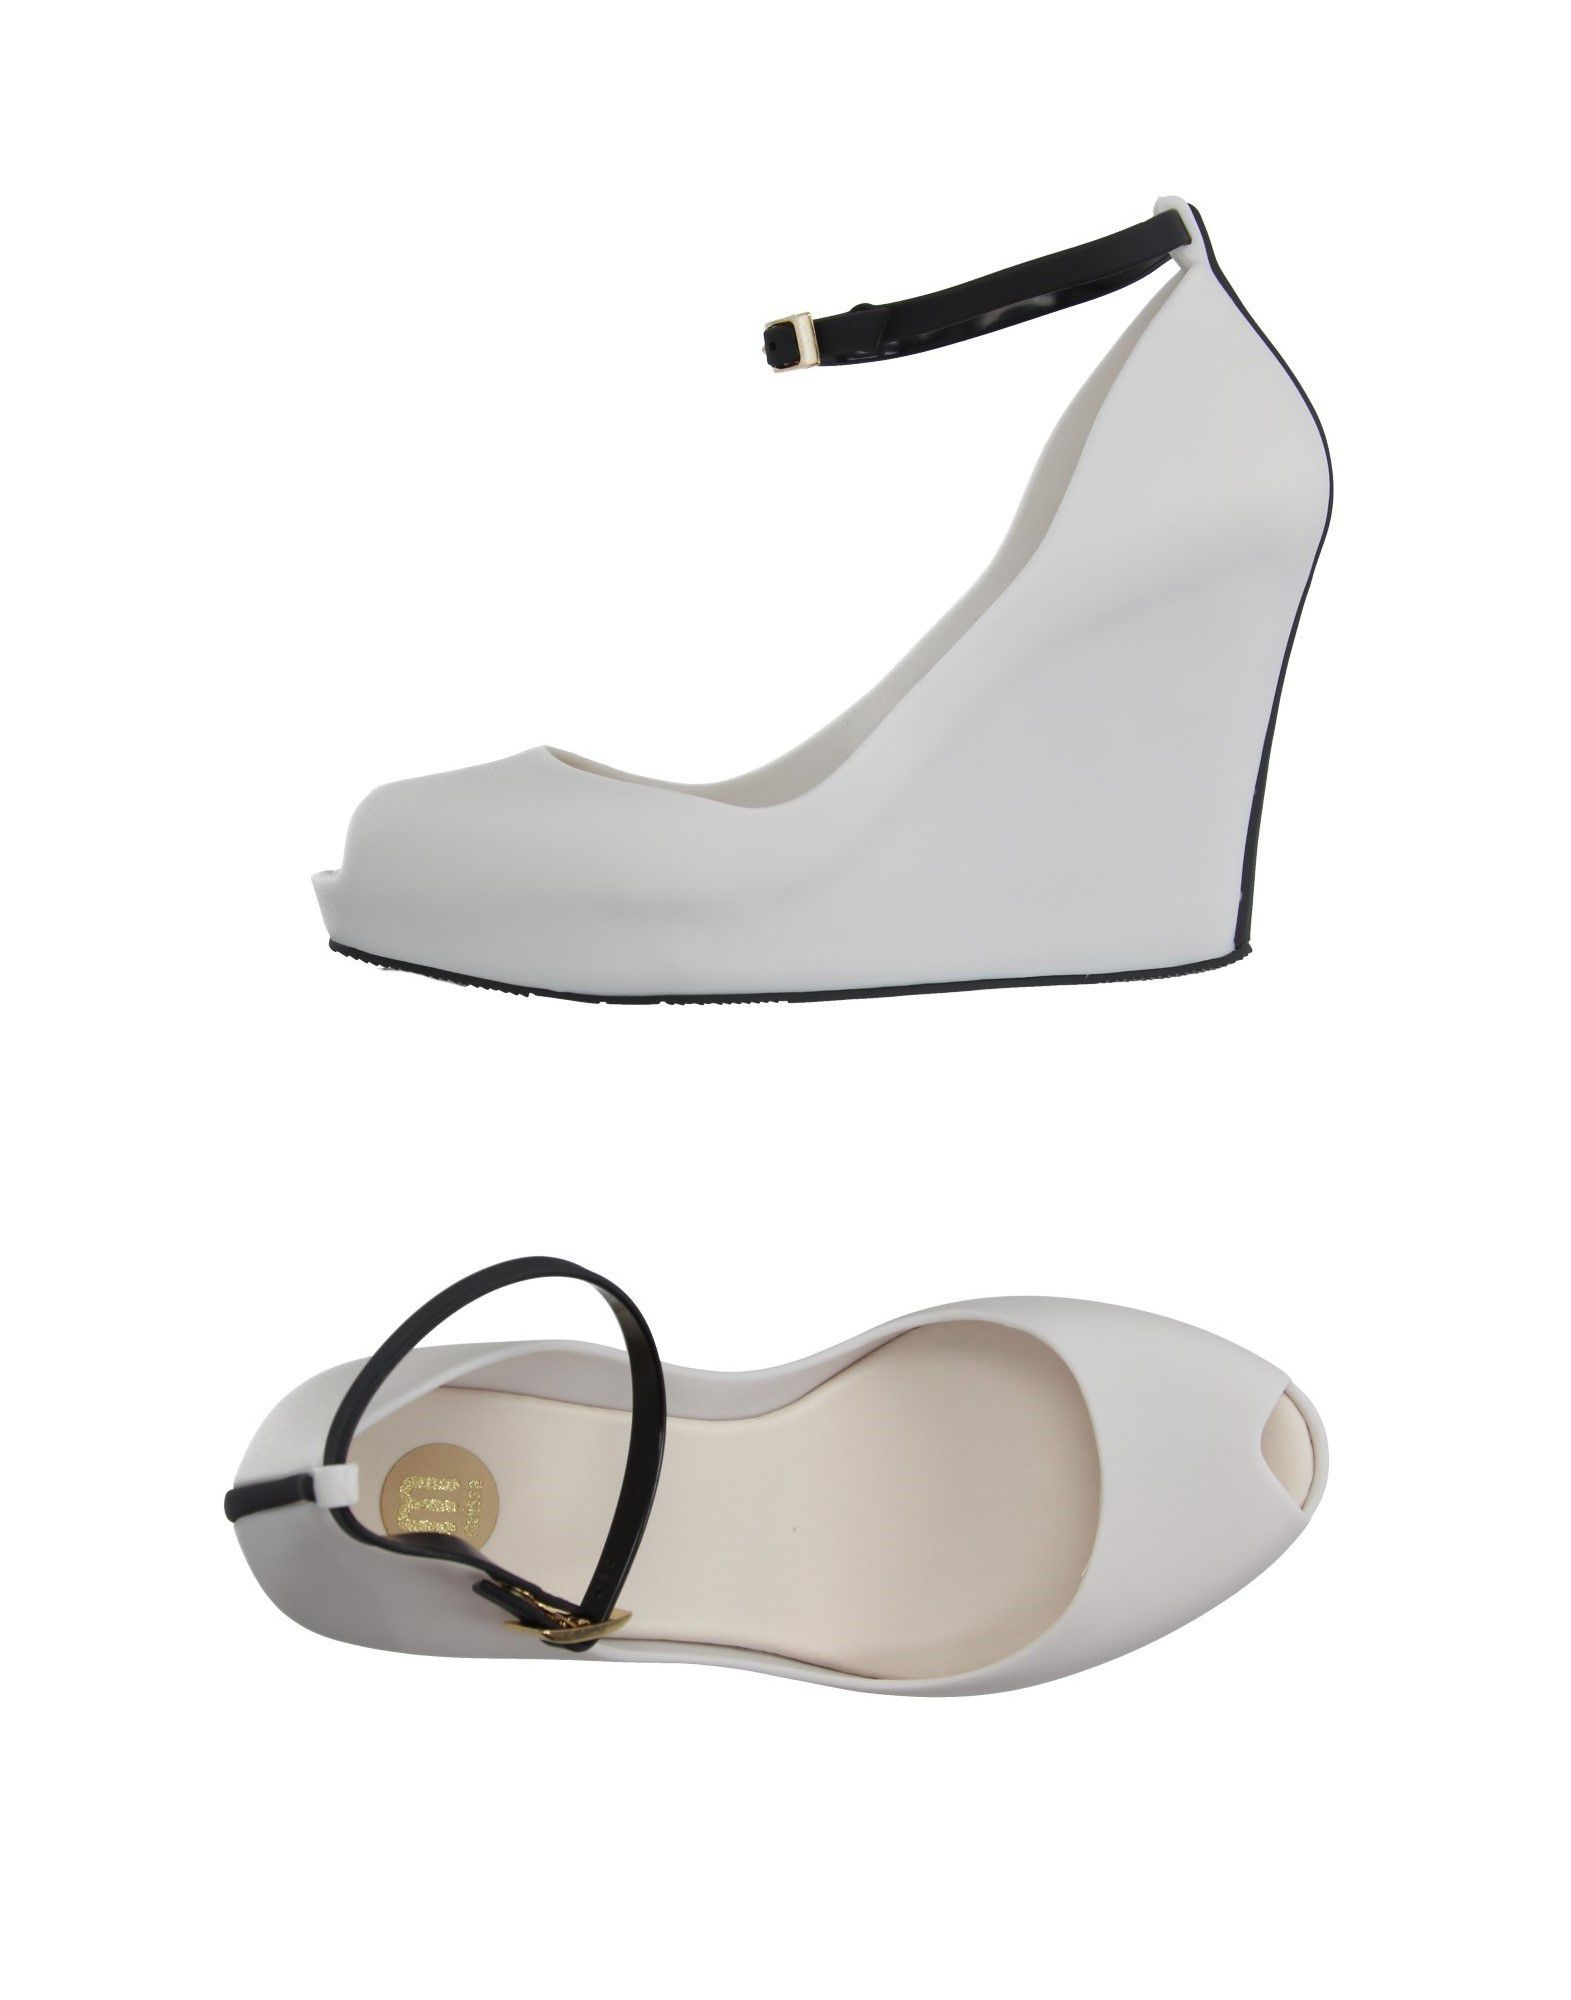 Sandali Nuove Fornarina Donna - 11564741LF Nuove Sandali offerte e scarpe comode 4bdef6